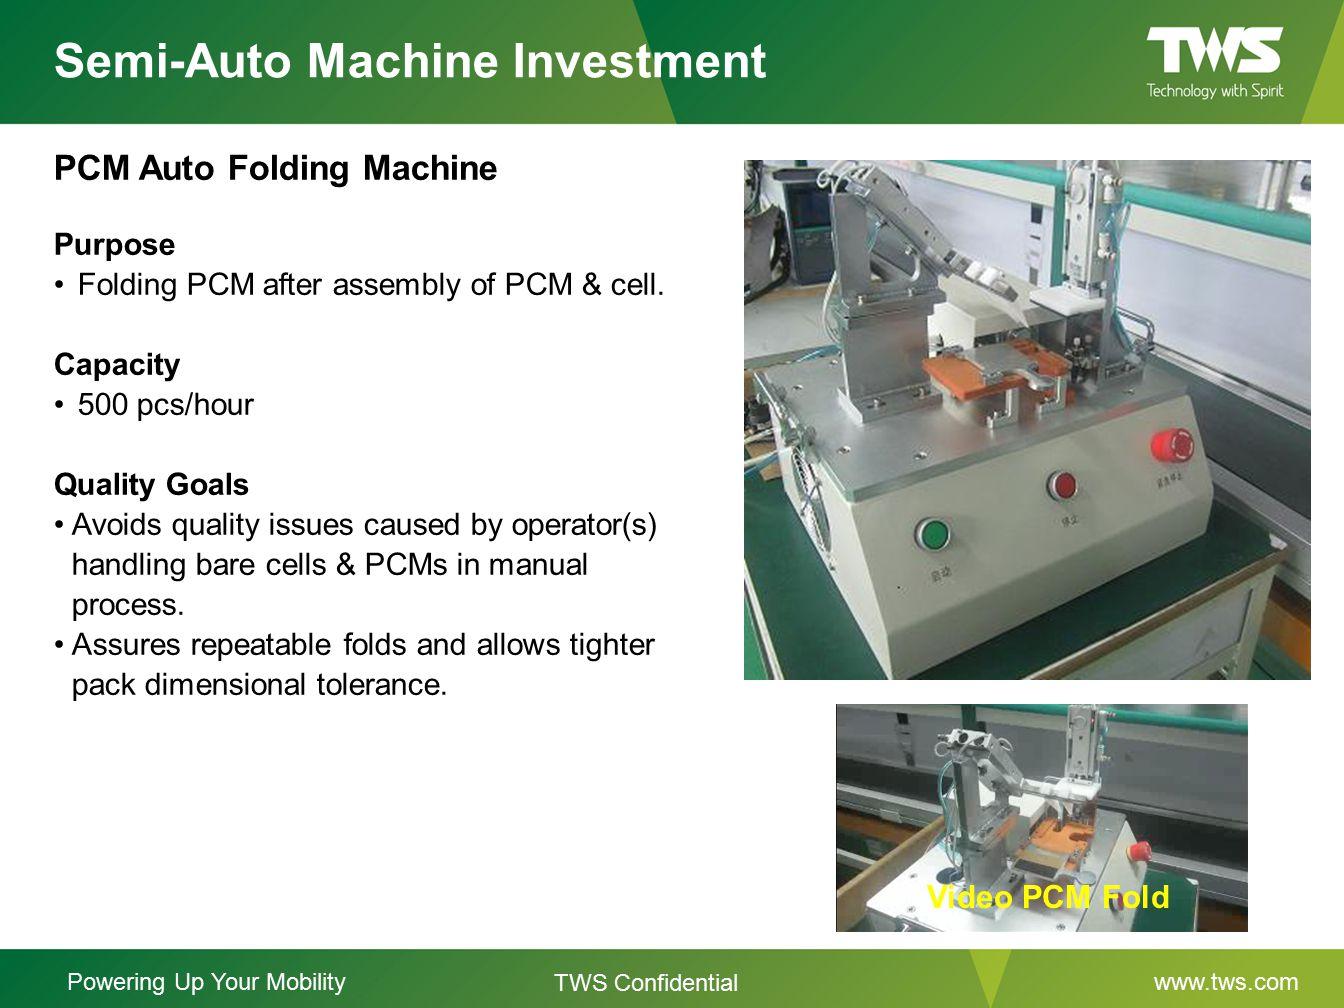 Semi-Auto Machine Investment